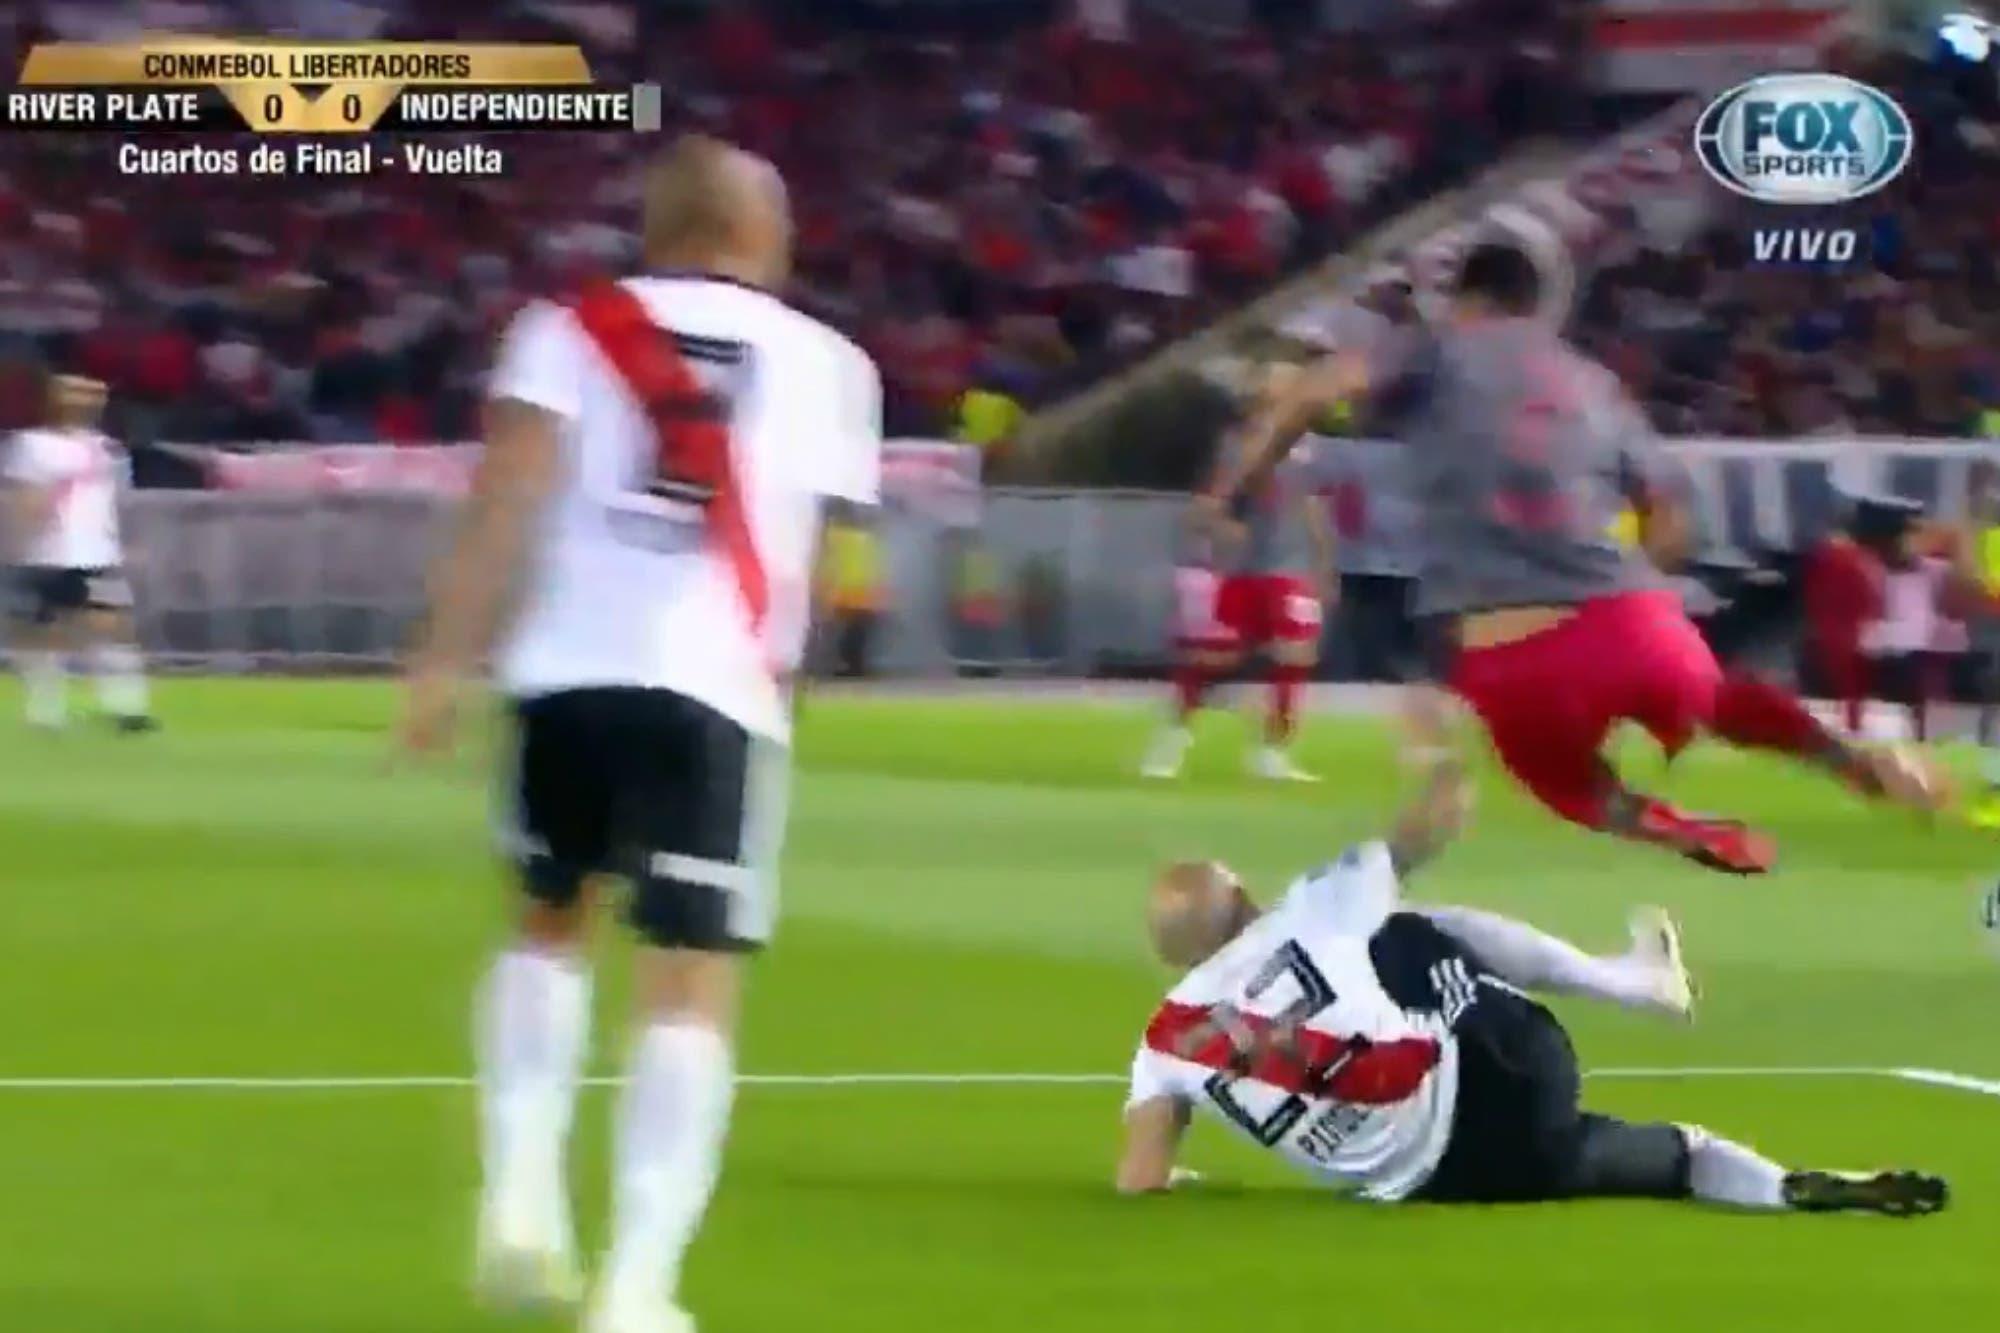 River-Independiente: el uso del VAR no advirtió un penal de Javier Pinola sobre Martín Benítez